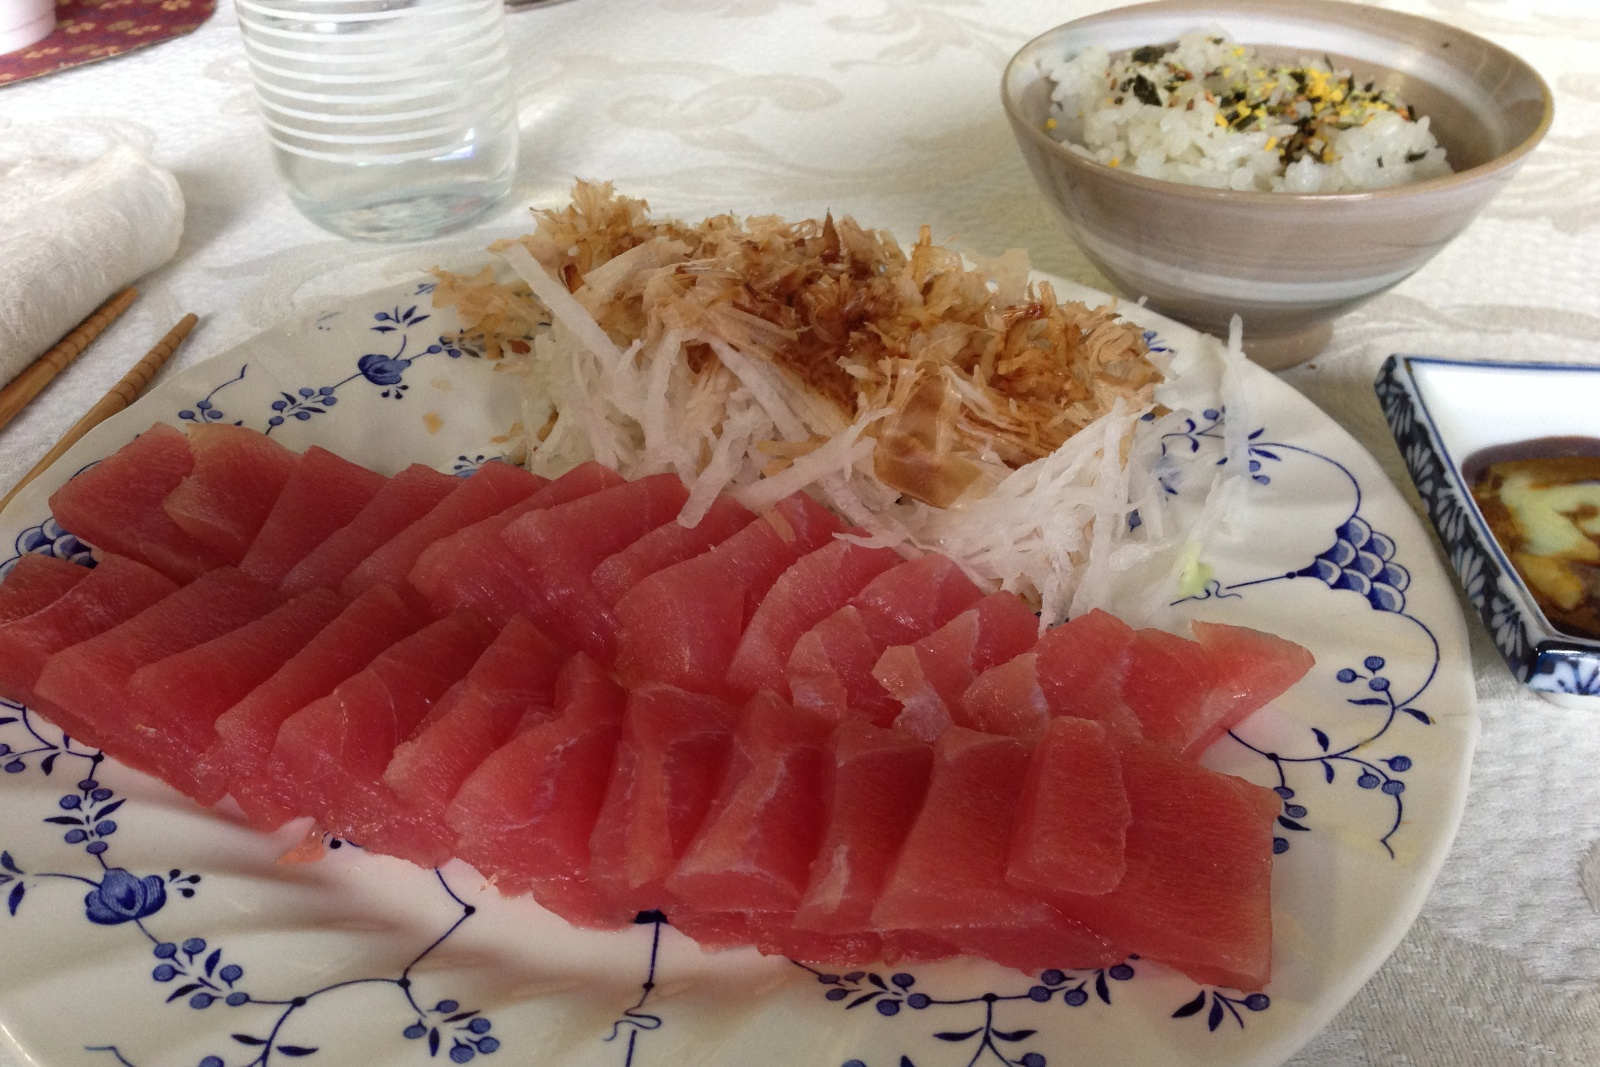 http://blog.rickk.com/food/2013/10/14/ate.2013.10.14.l.jpg